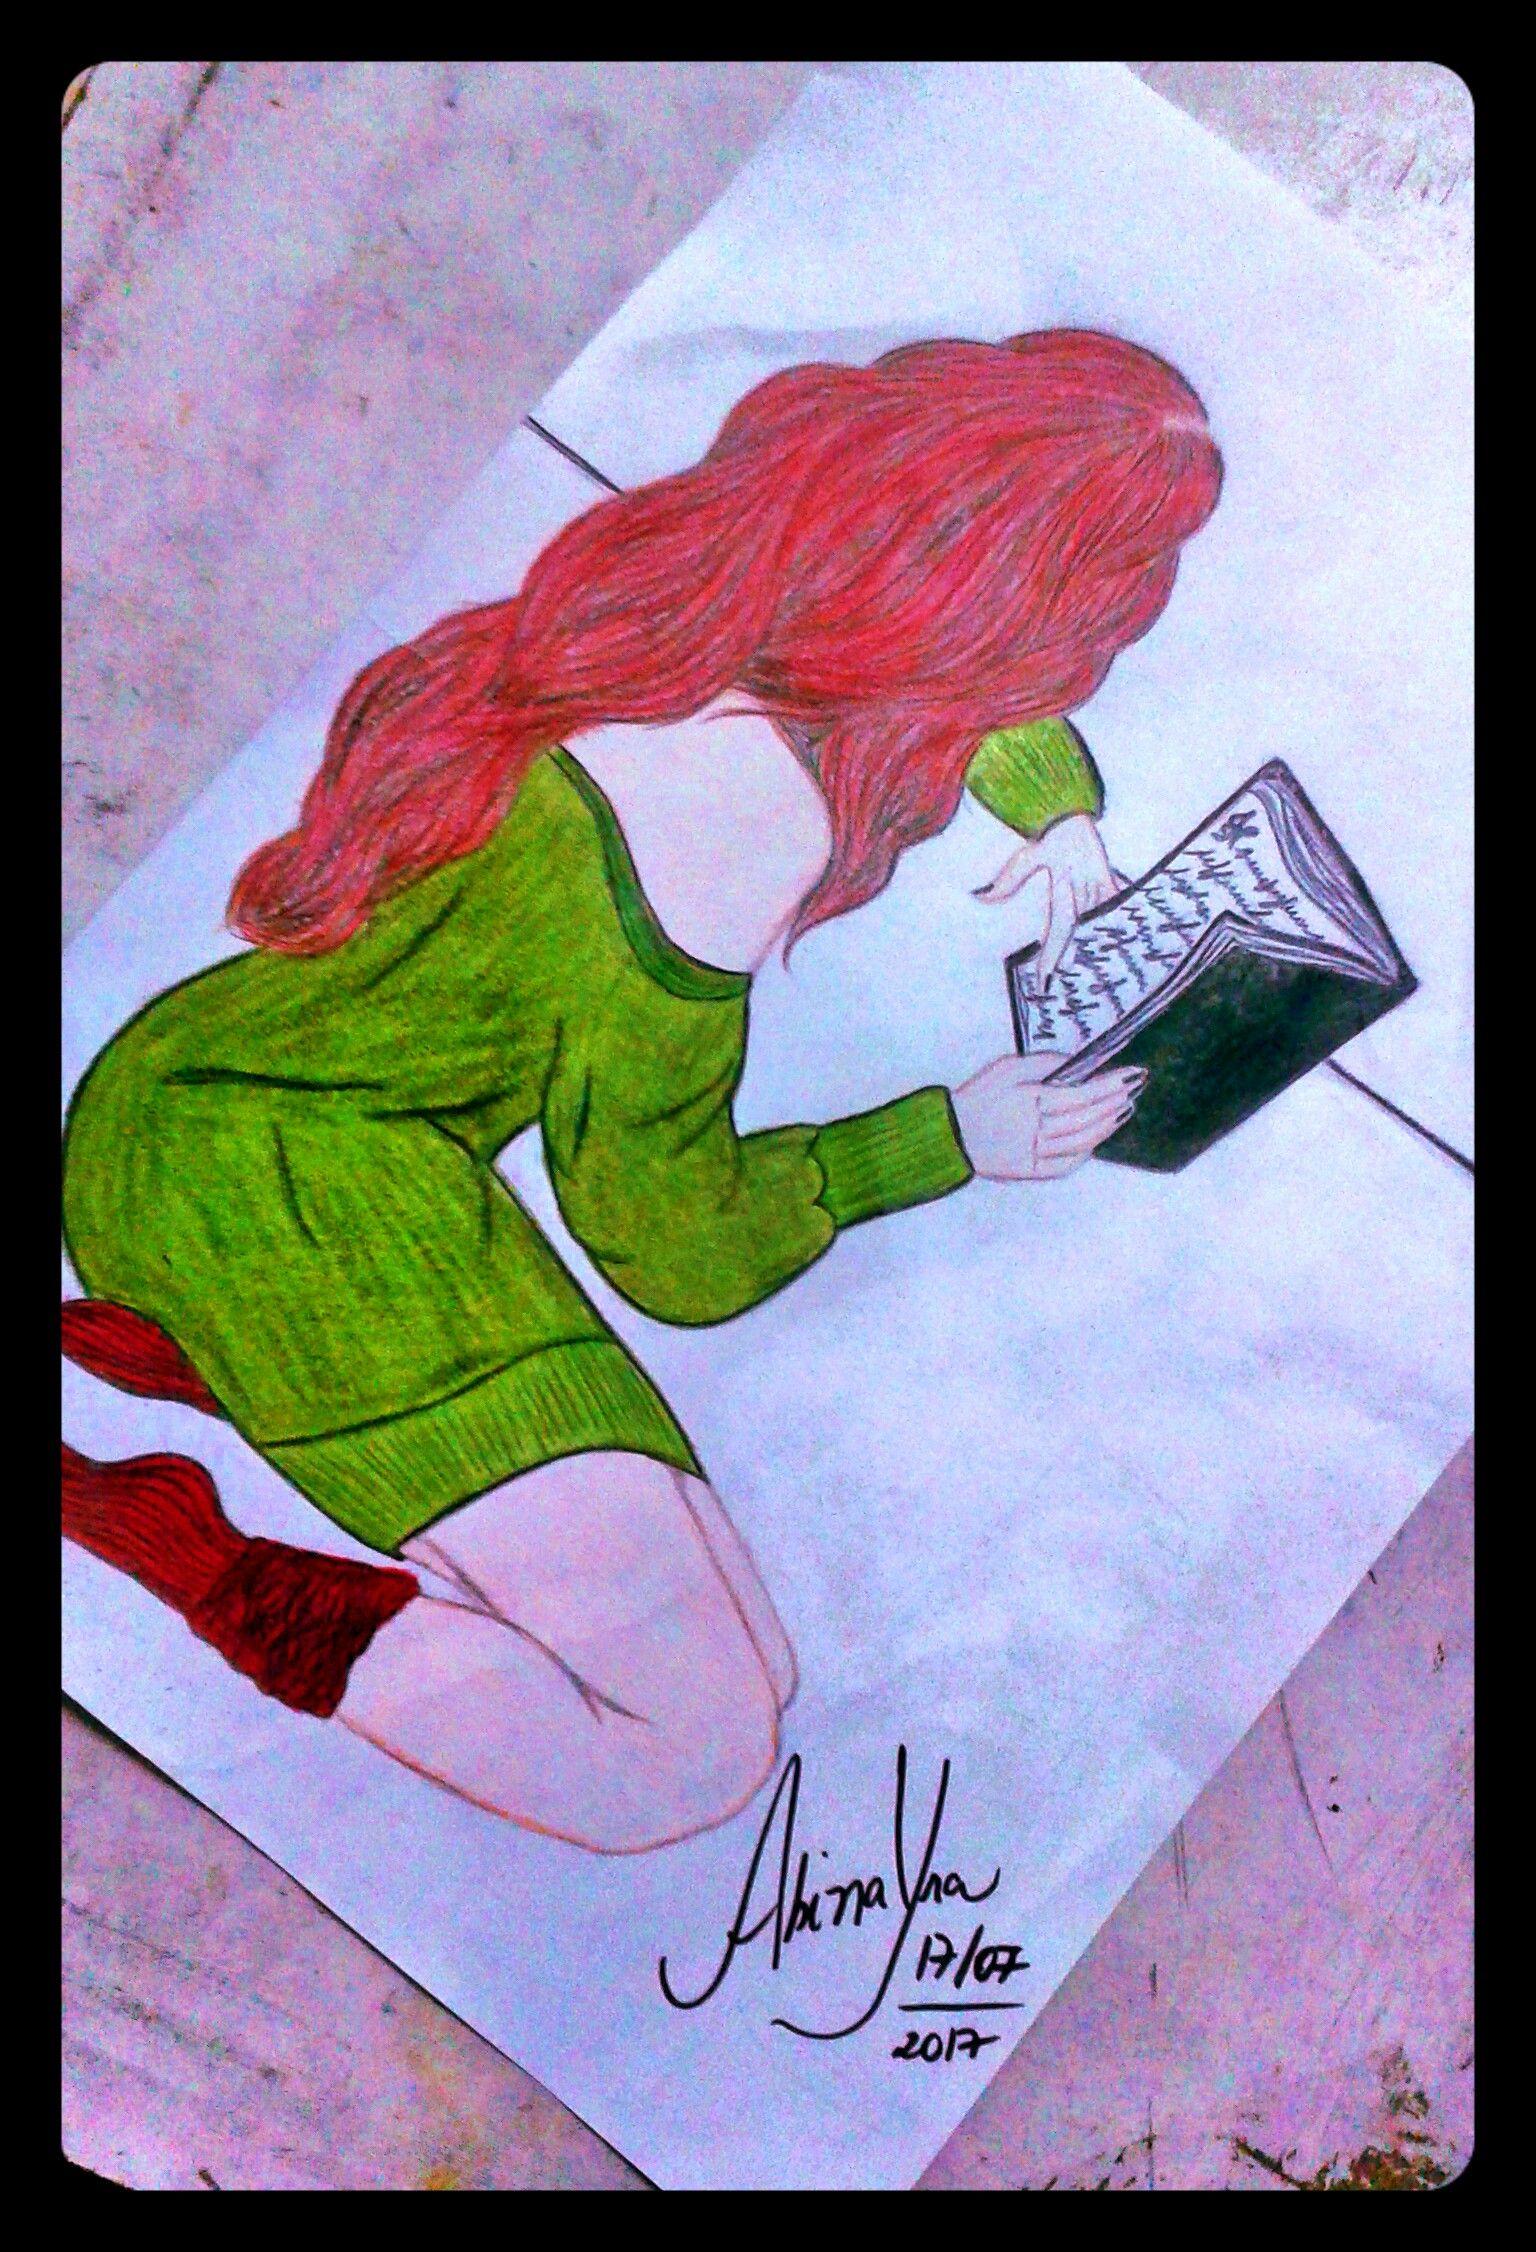 """Experimentando as cores"" #Ruiva"